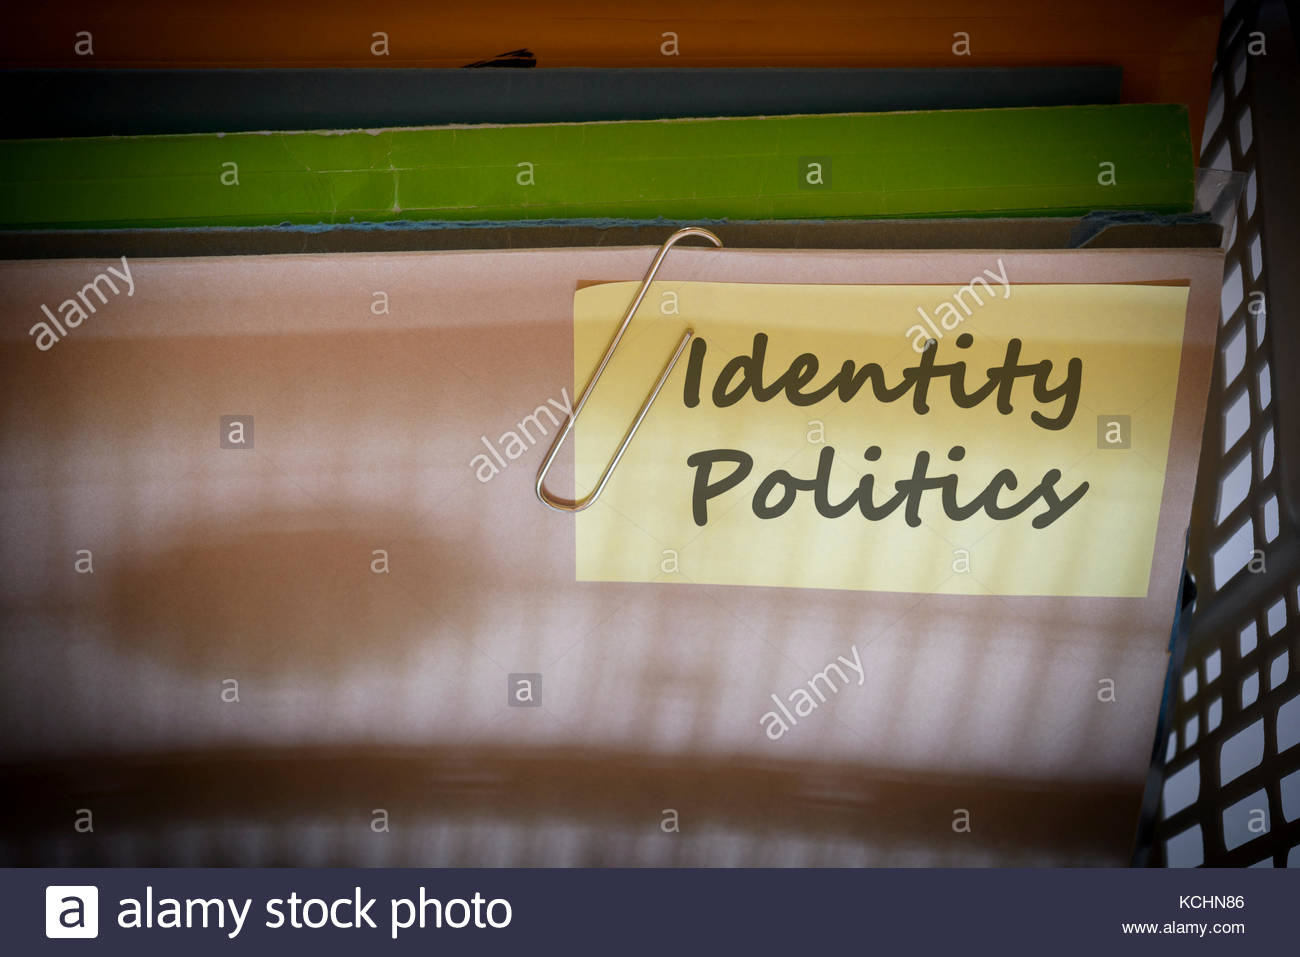 Identity Politics written on document folder, Dorset, England. - Stock Image